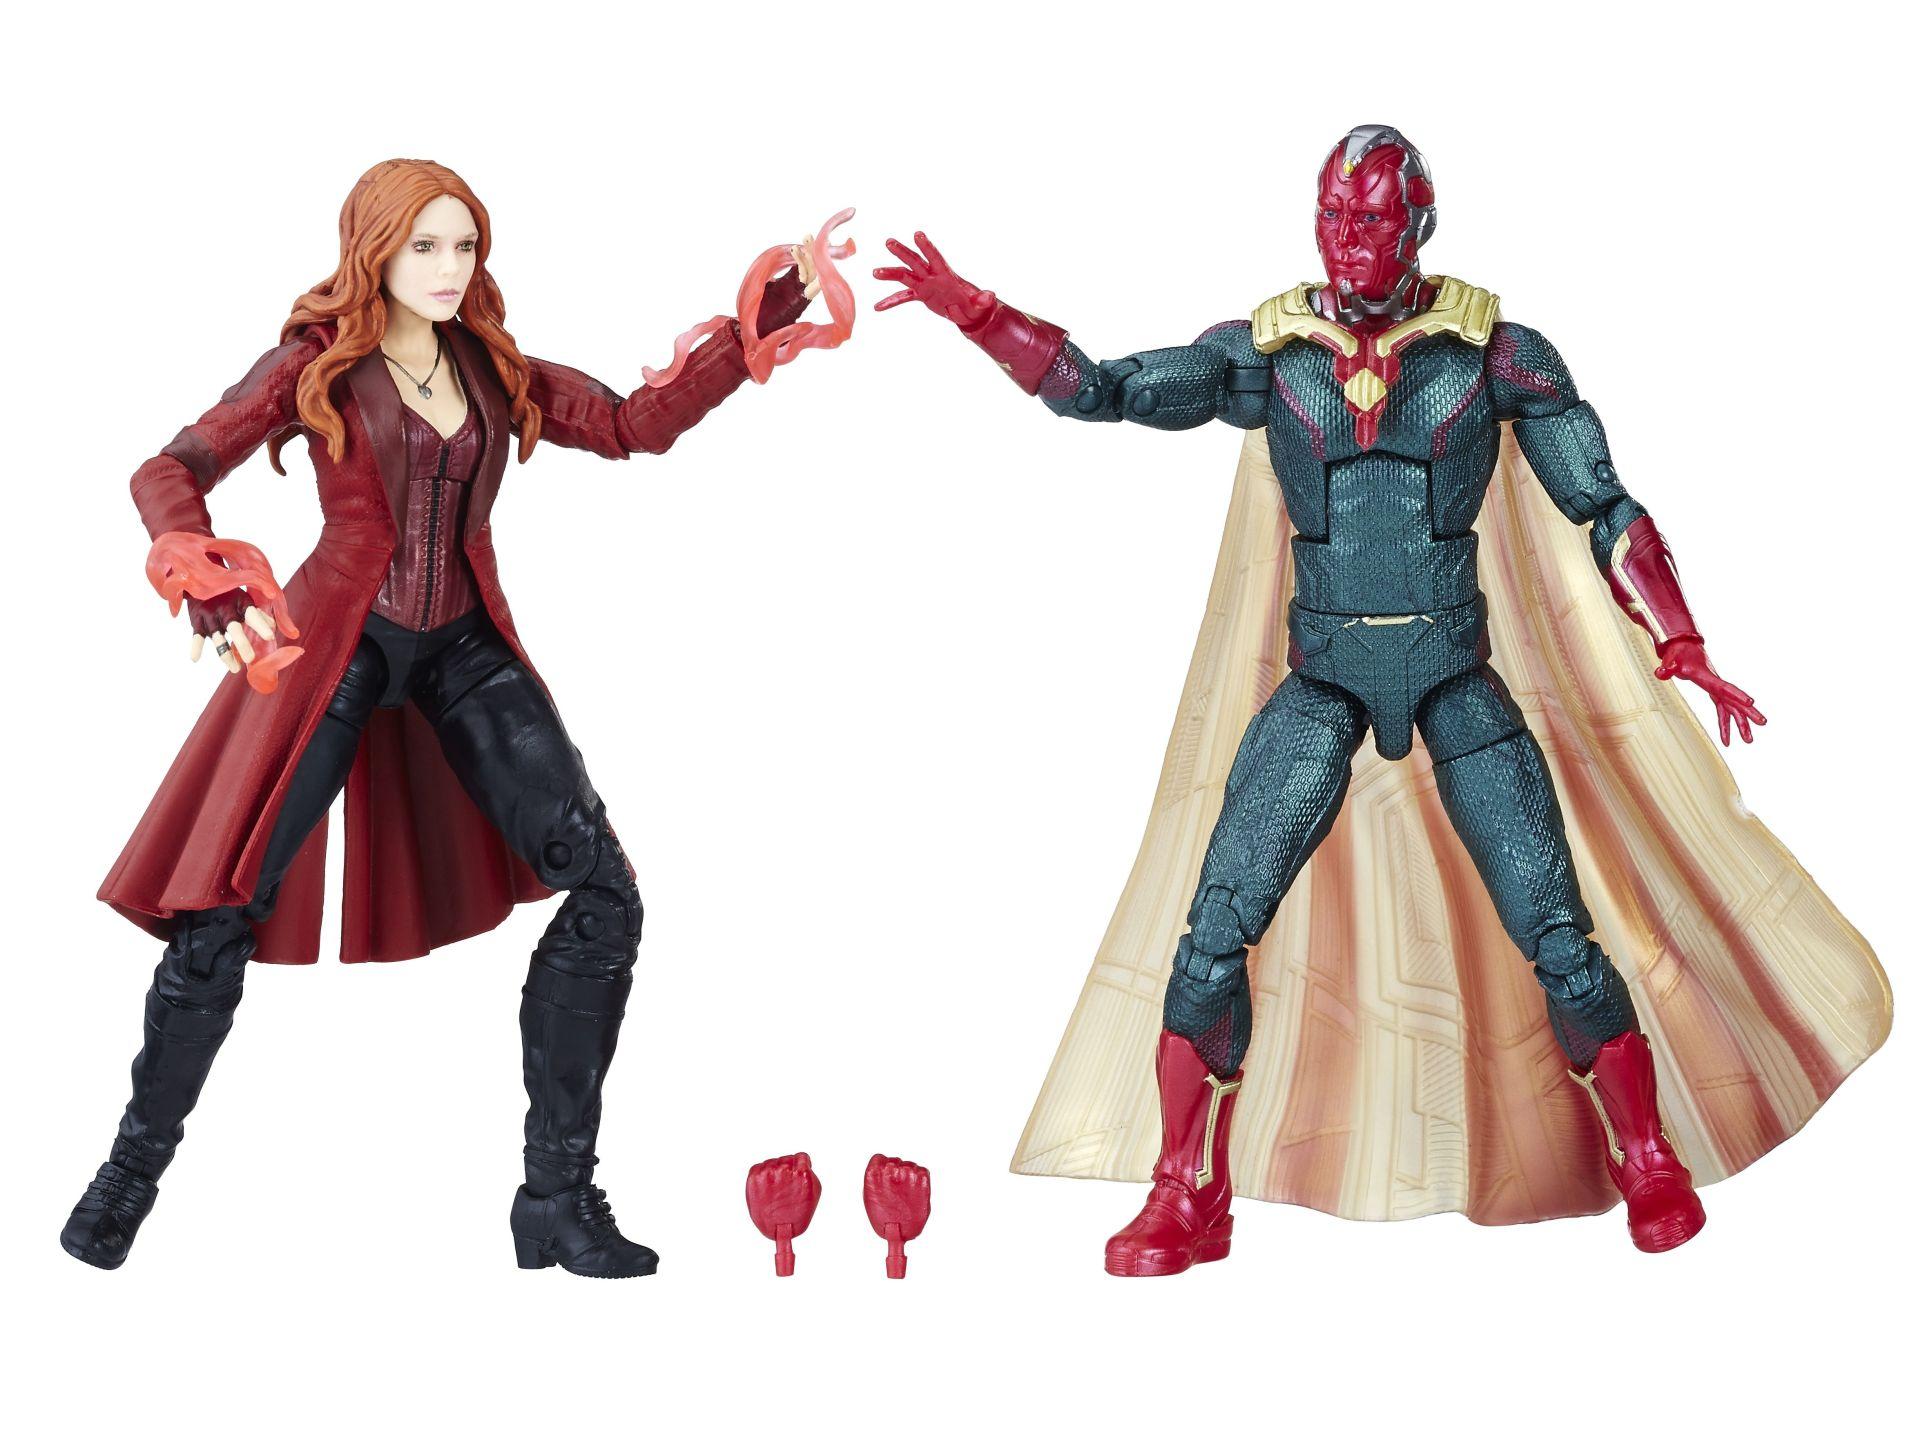 Most Inspiring Vision Wanda Infinity War Wallpaper - MARVEL-AVENGERS-INFINITY-WAR-LEGENDS-SERIES-6-INCH-Figures-Scarlet-Witch-Marvels-Vision-oop  Pic_68569 .jpg